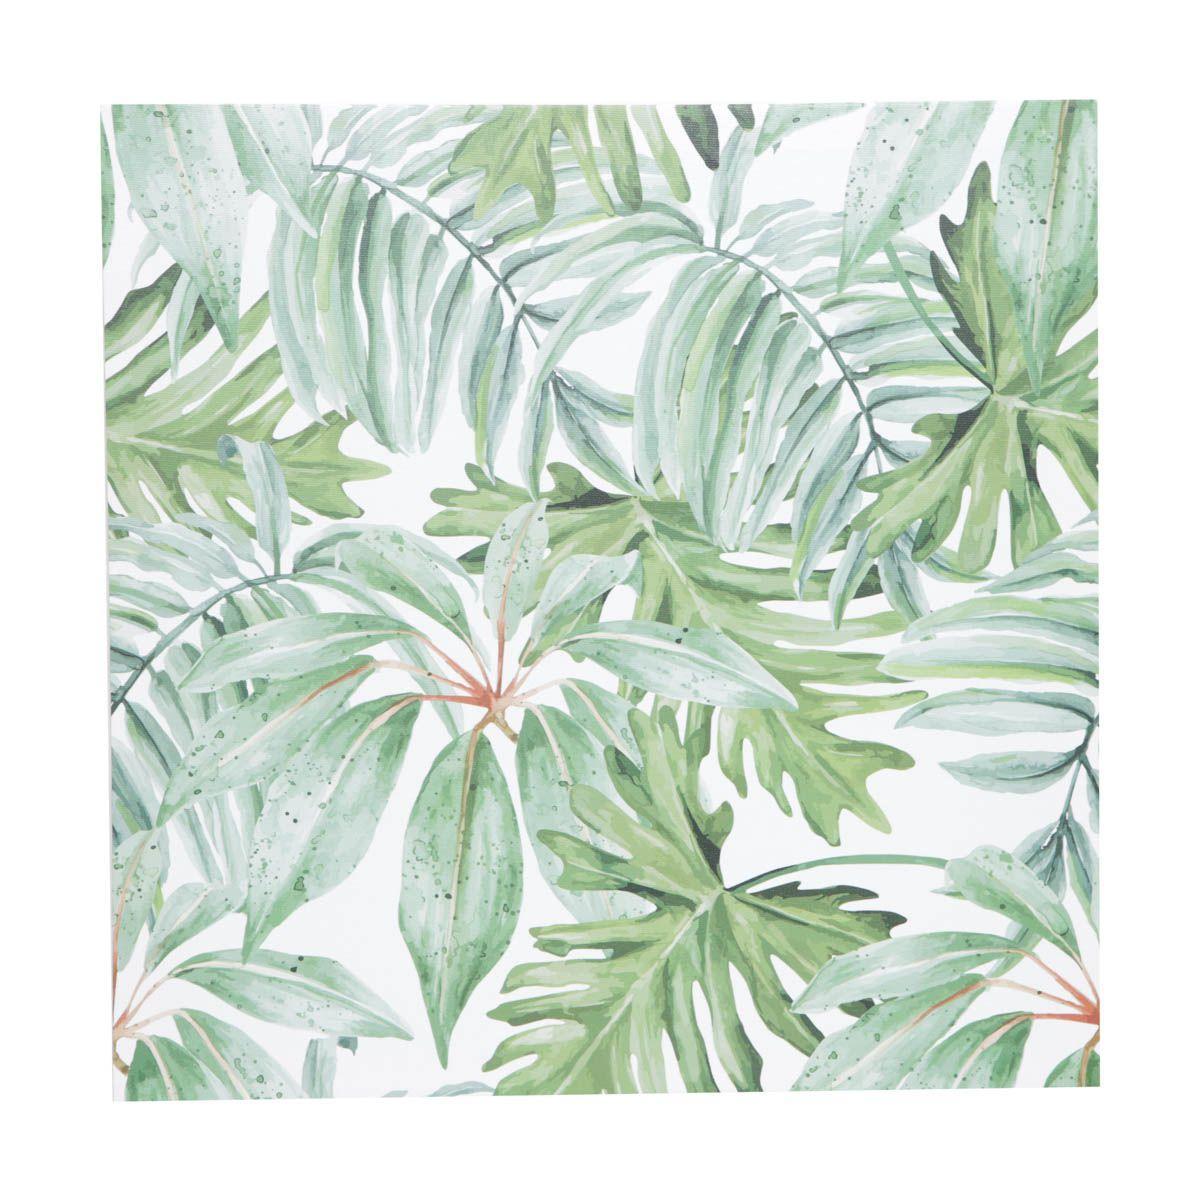 Quadro Decorativo Bracken Leaves 40cm x 40cm - 40975